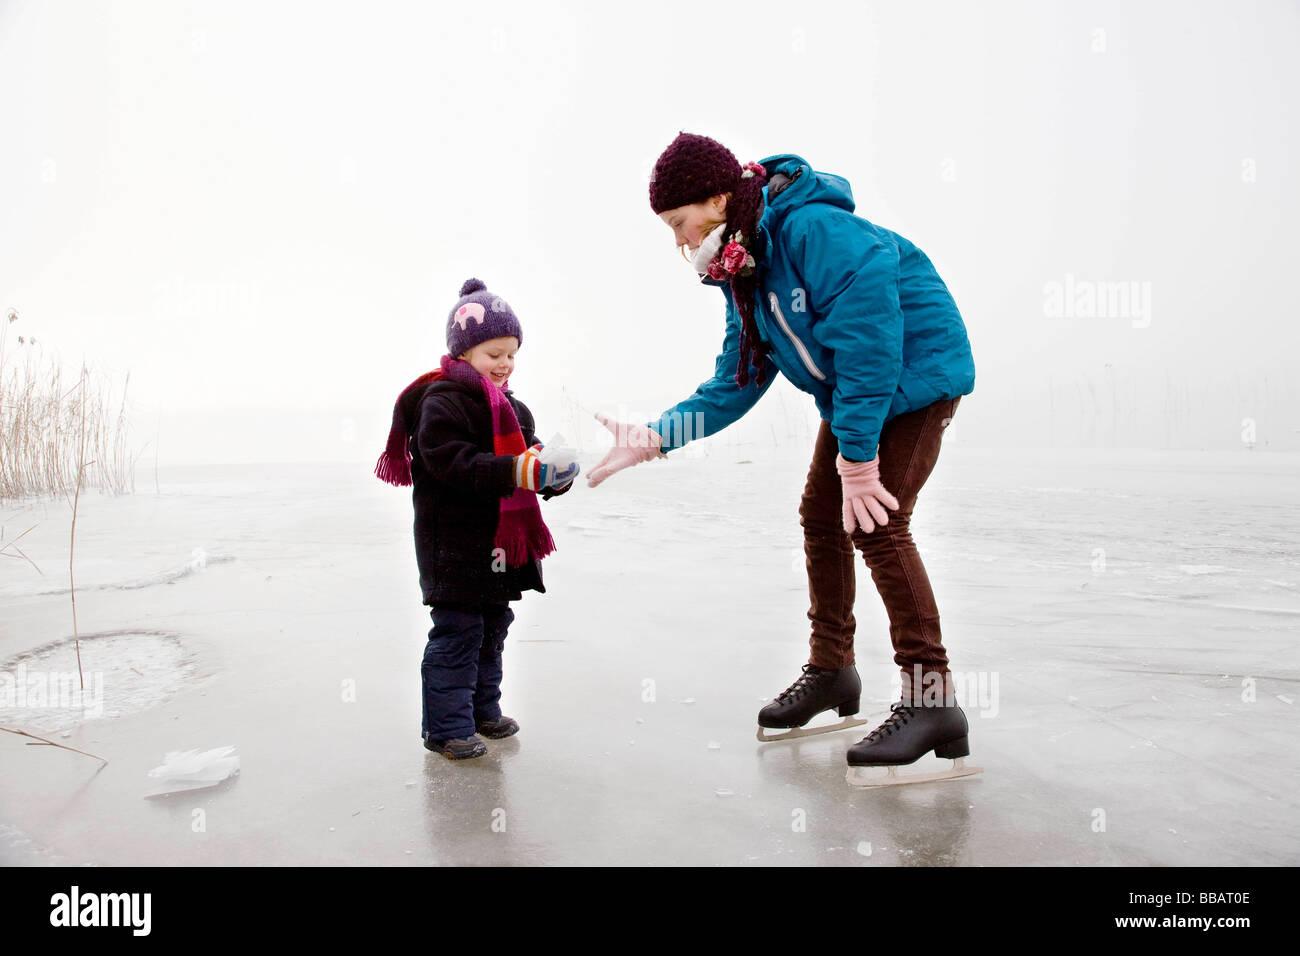 Girl and boy iceskating on frozen lake - Stock Image